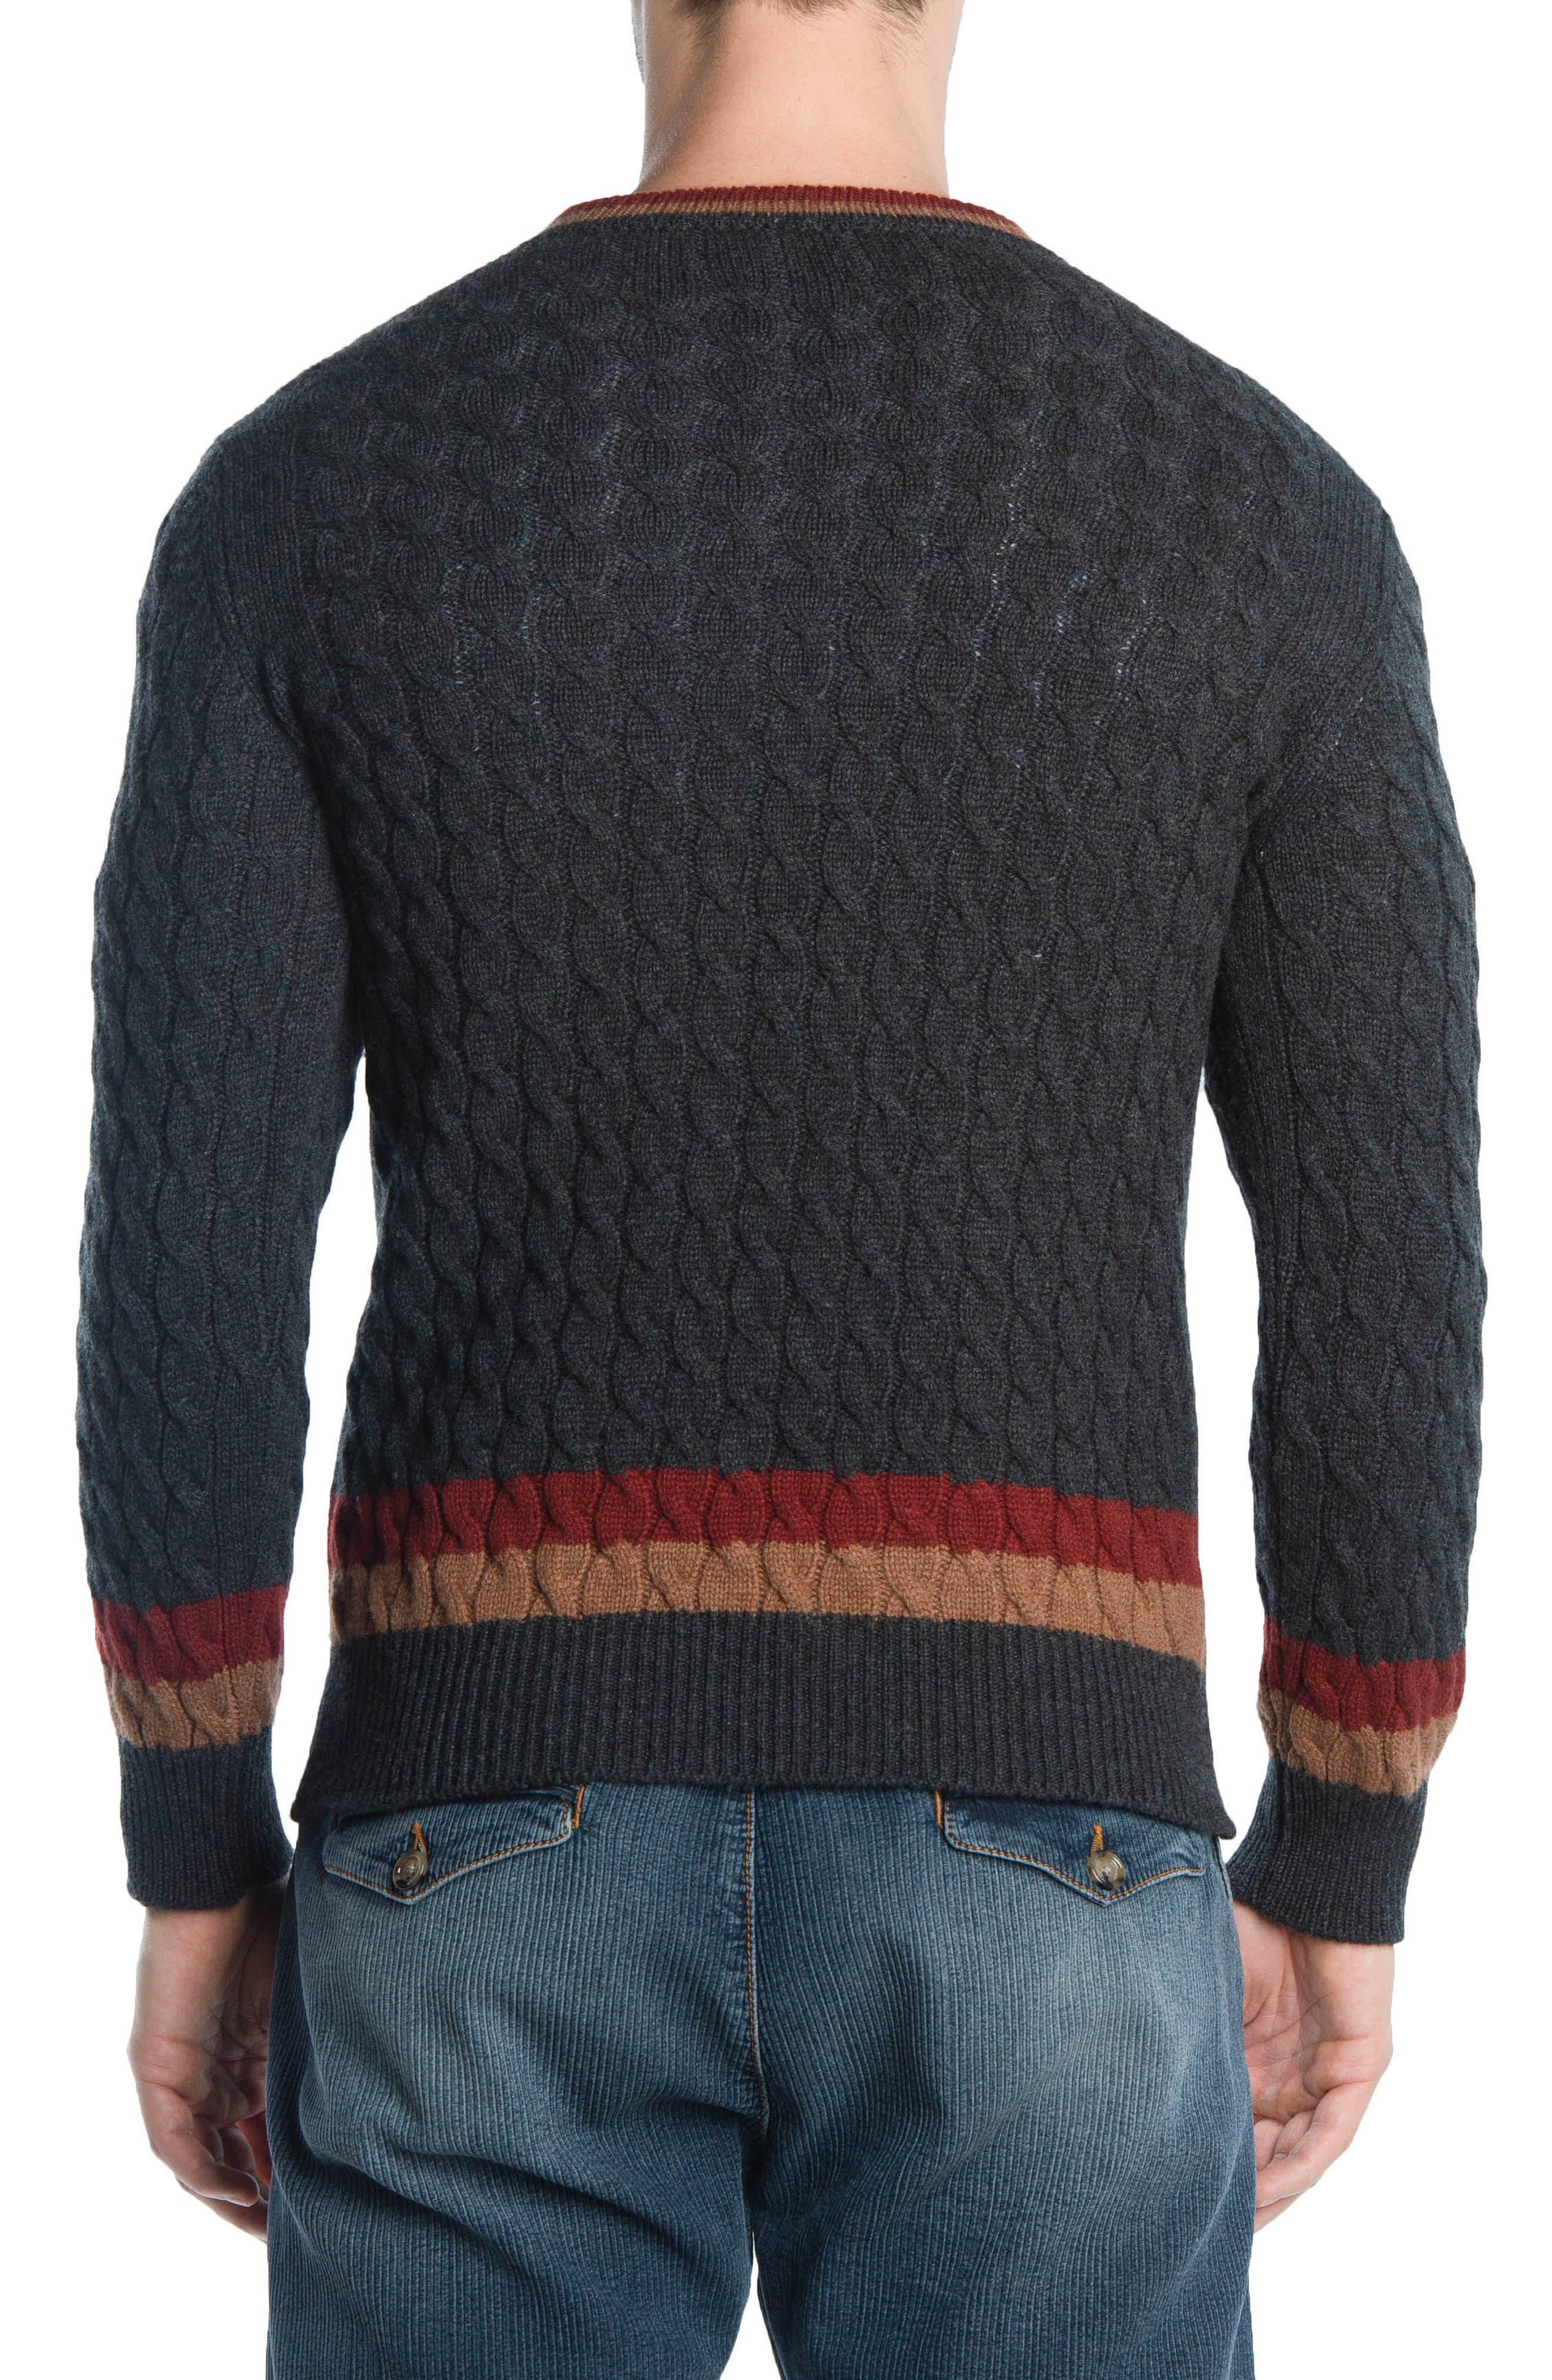 Cableknit Cashmere V-Neck Sweater,                             Alternate thumbnail 2, color,                             DARK GREY